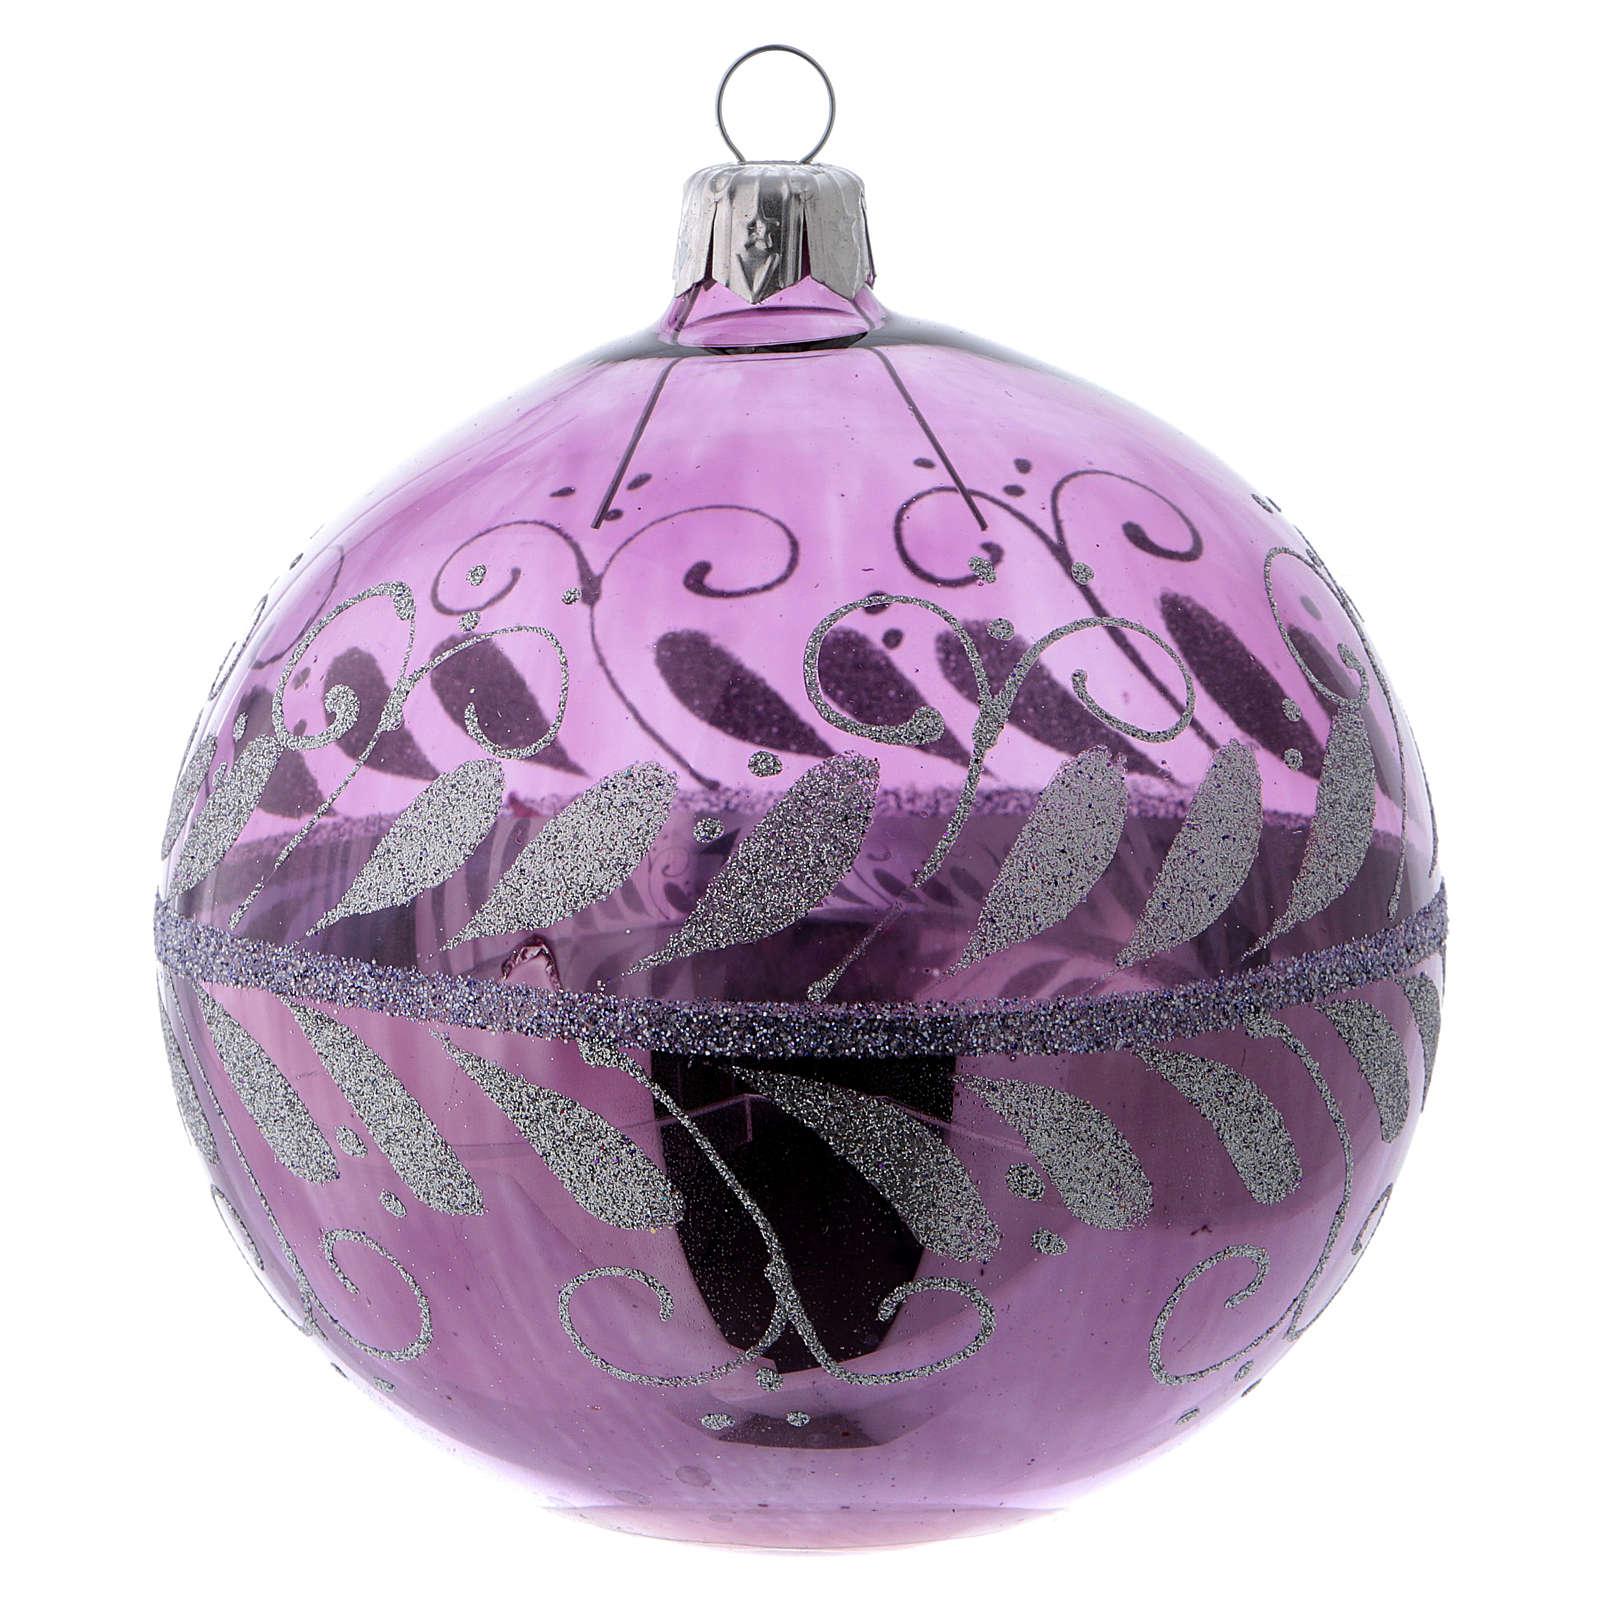 Bolita vidrio lila con decoración plata 100 mm 4